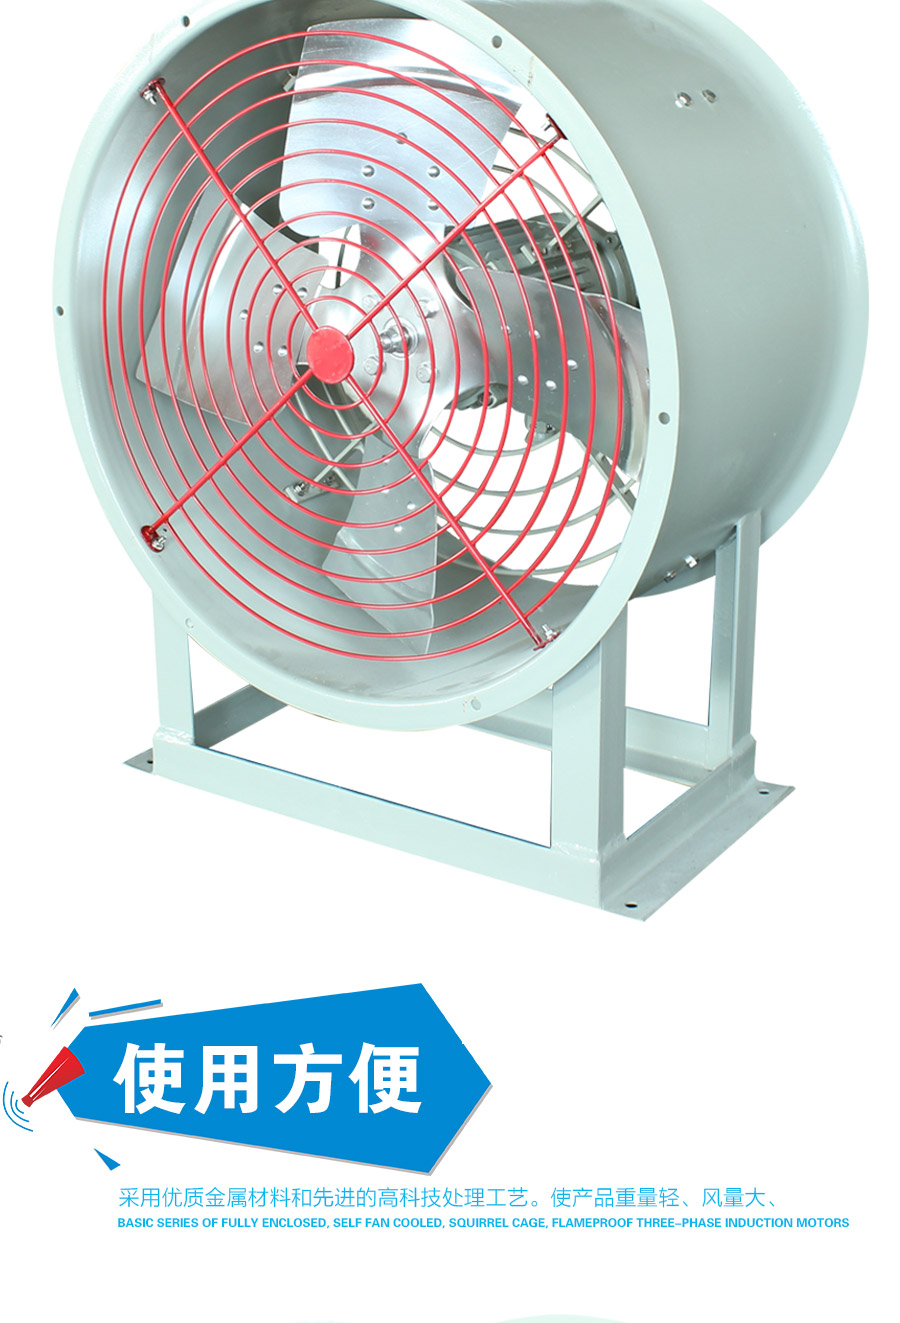 BT35-11-7.1/380Ⅳ(4KW)型号电机安装和尺寸与外形尺寸图4